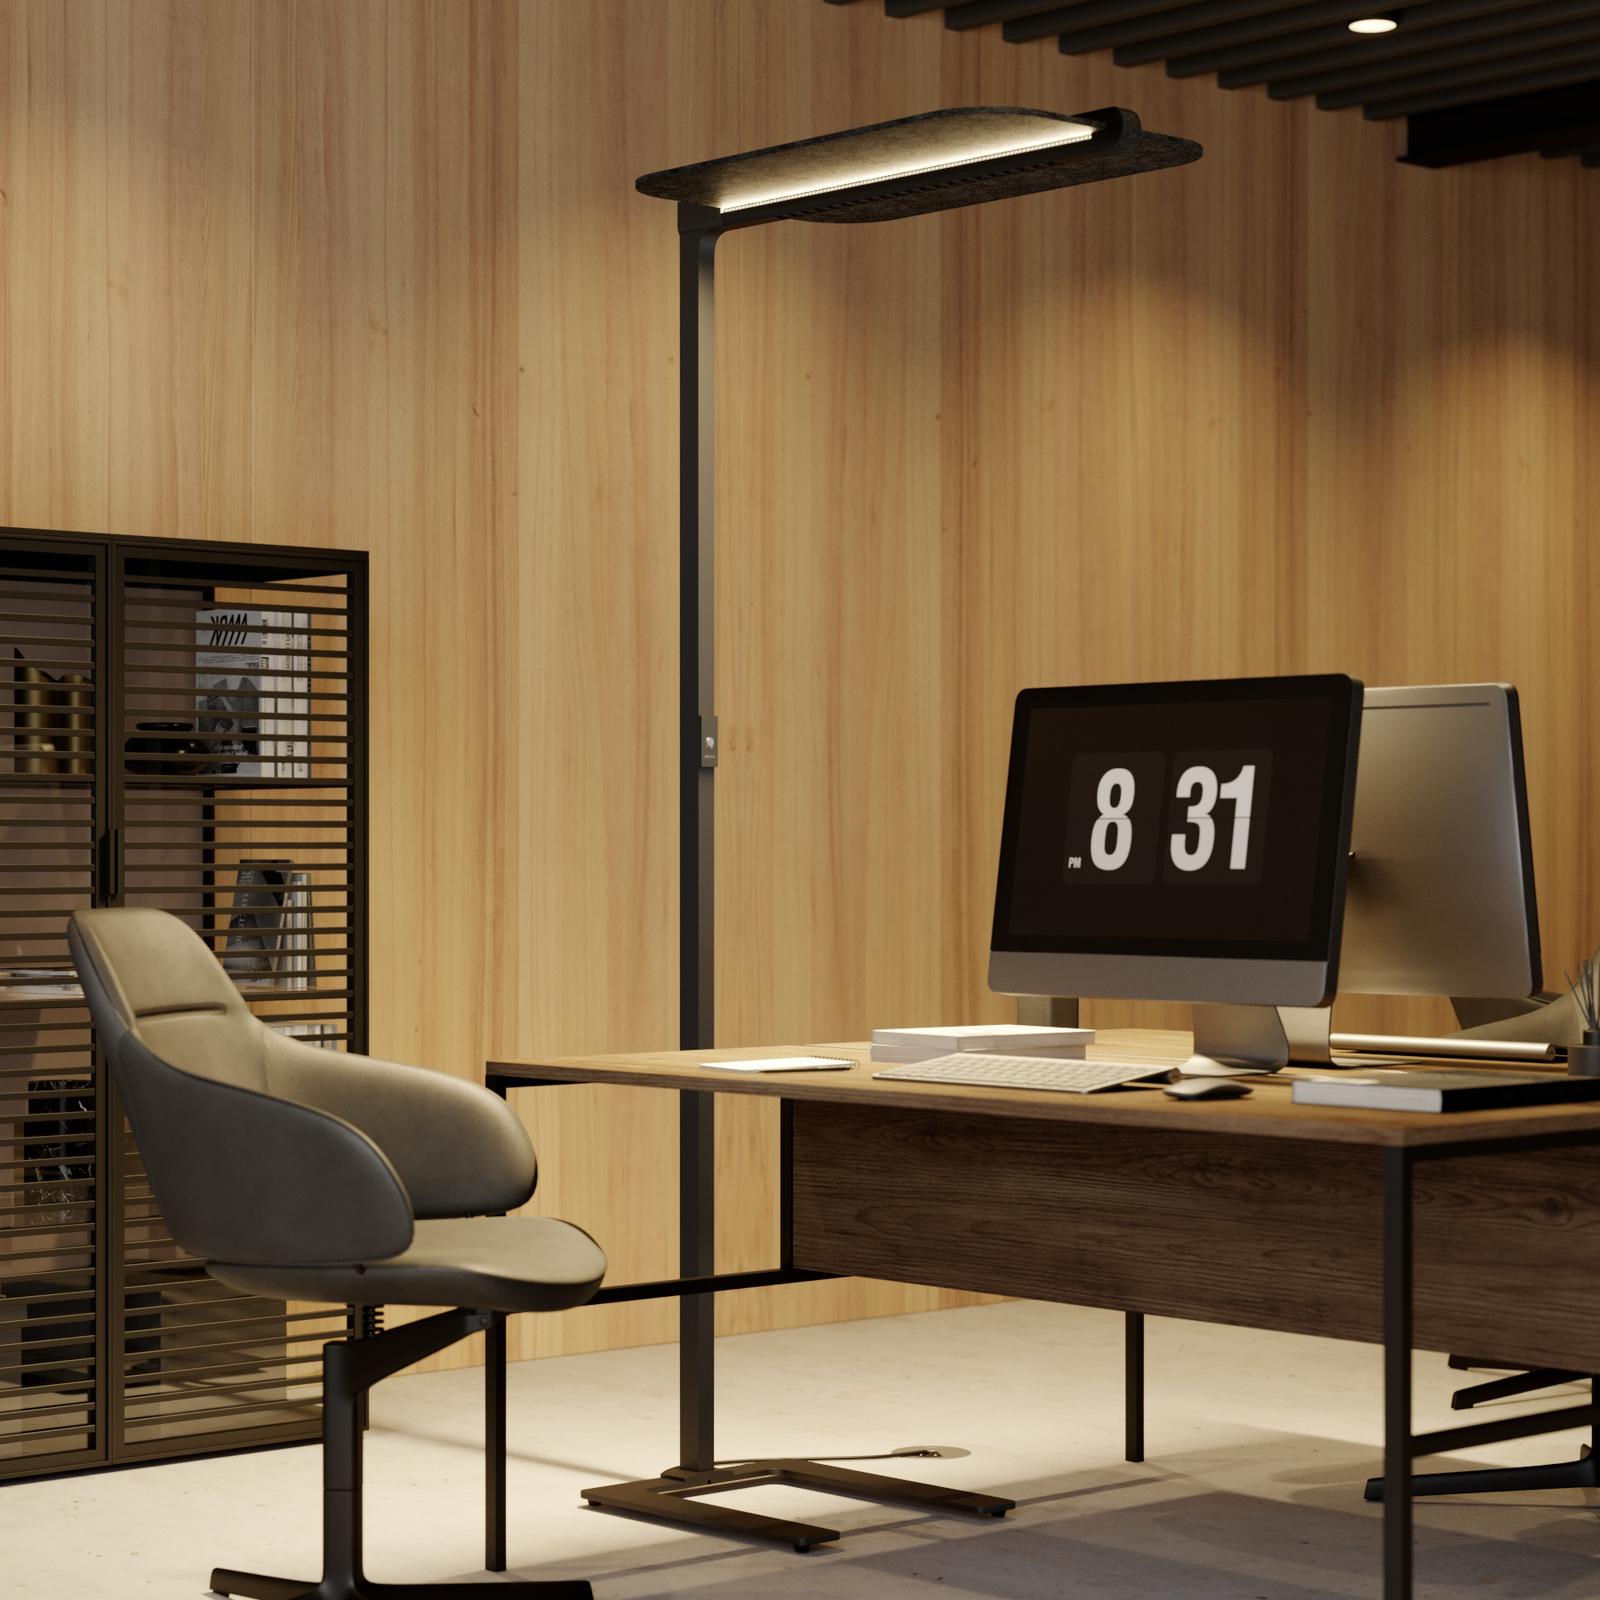 Arcchio Ameir LED kantoor vloerlamp, vilt grijs